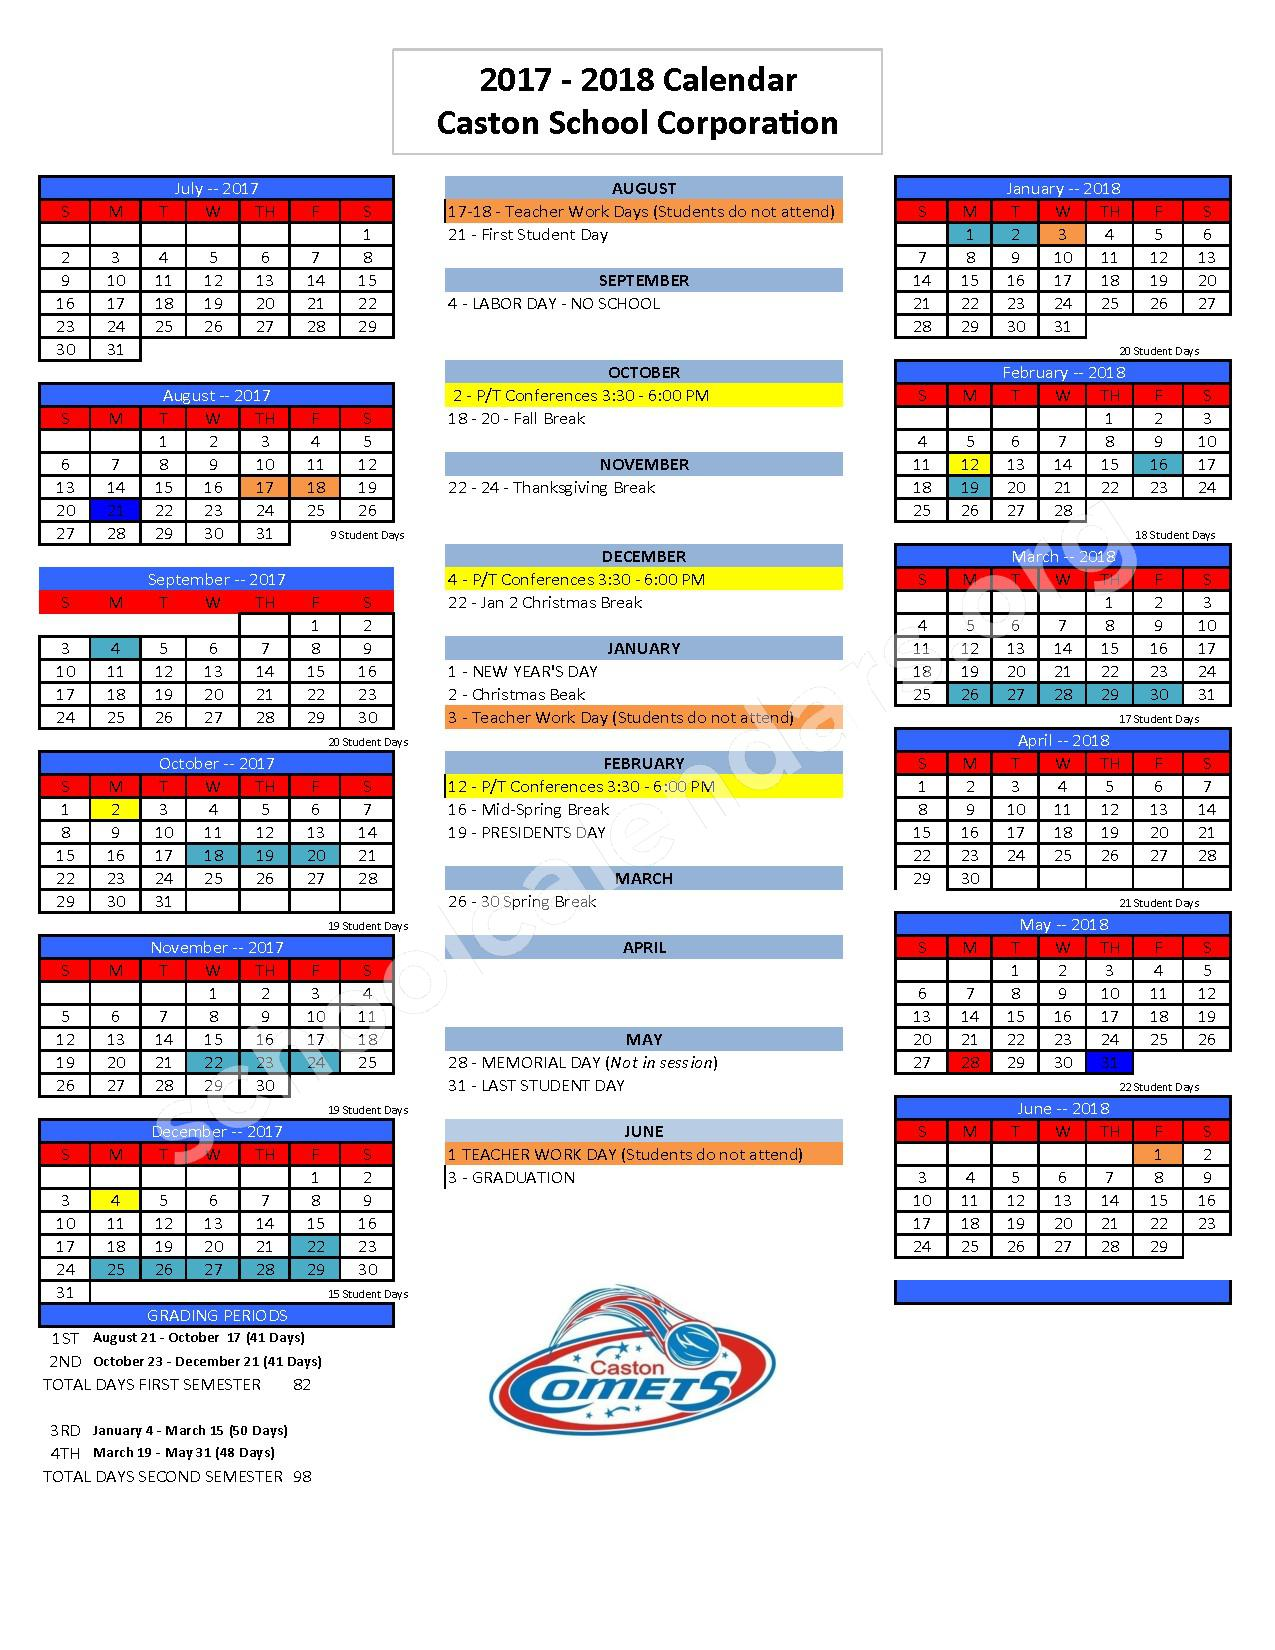 2017 - 2018 District Calendar – Caston School Corporation – page 1